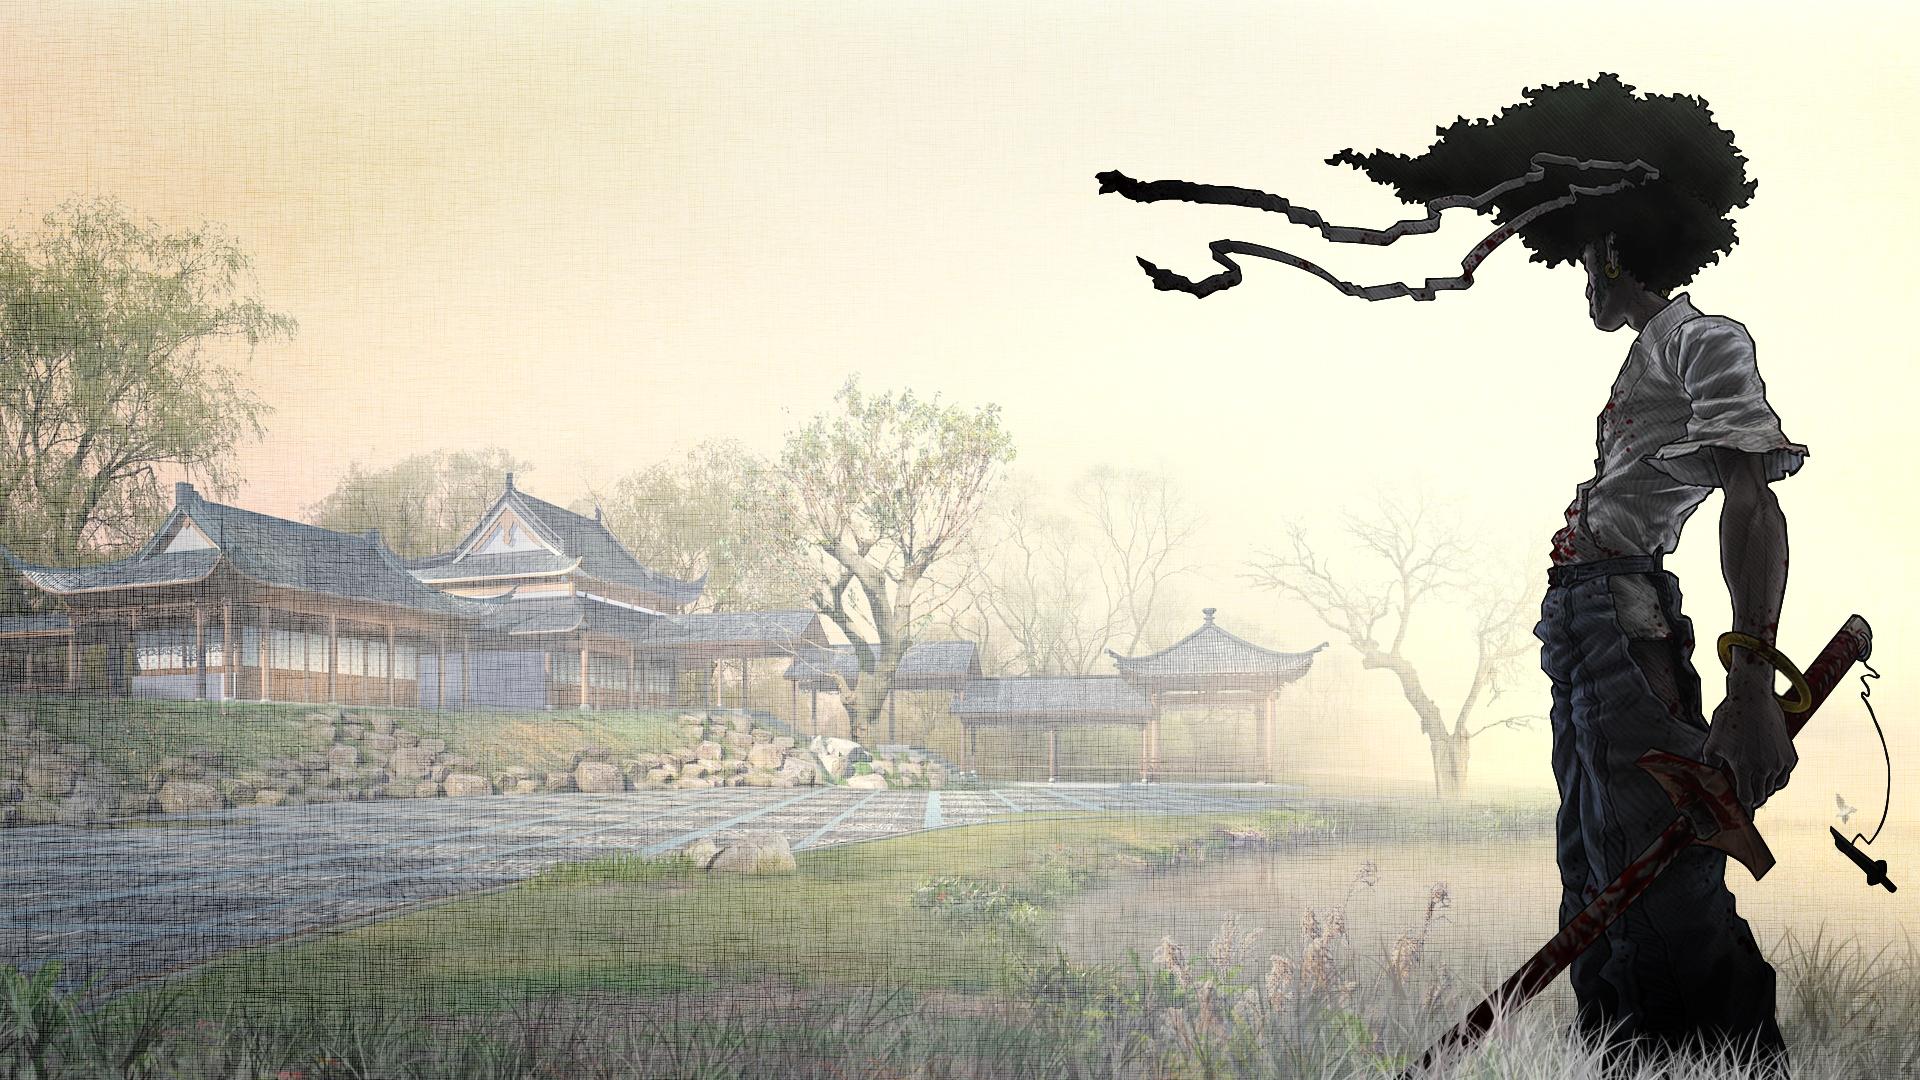 [68+] Afro Samurai Wallpaper Hd on WallpaperSafari